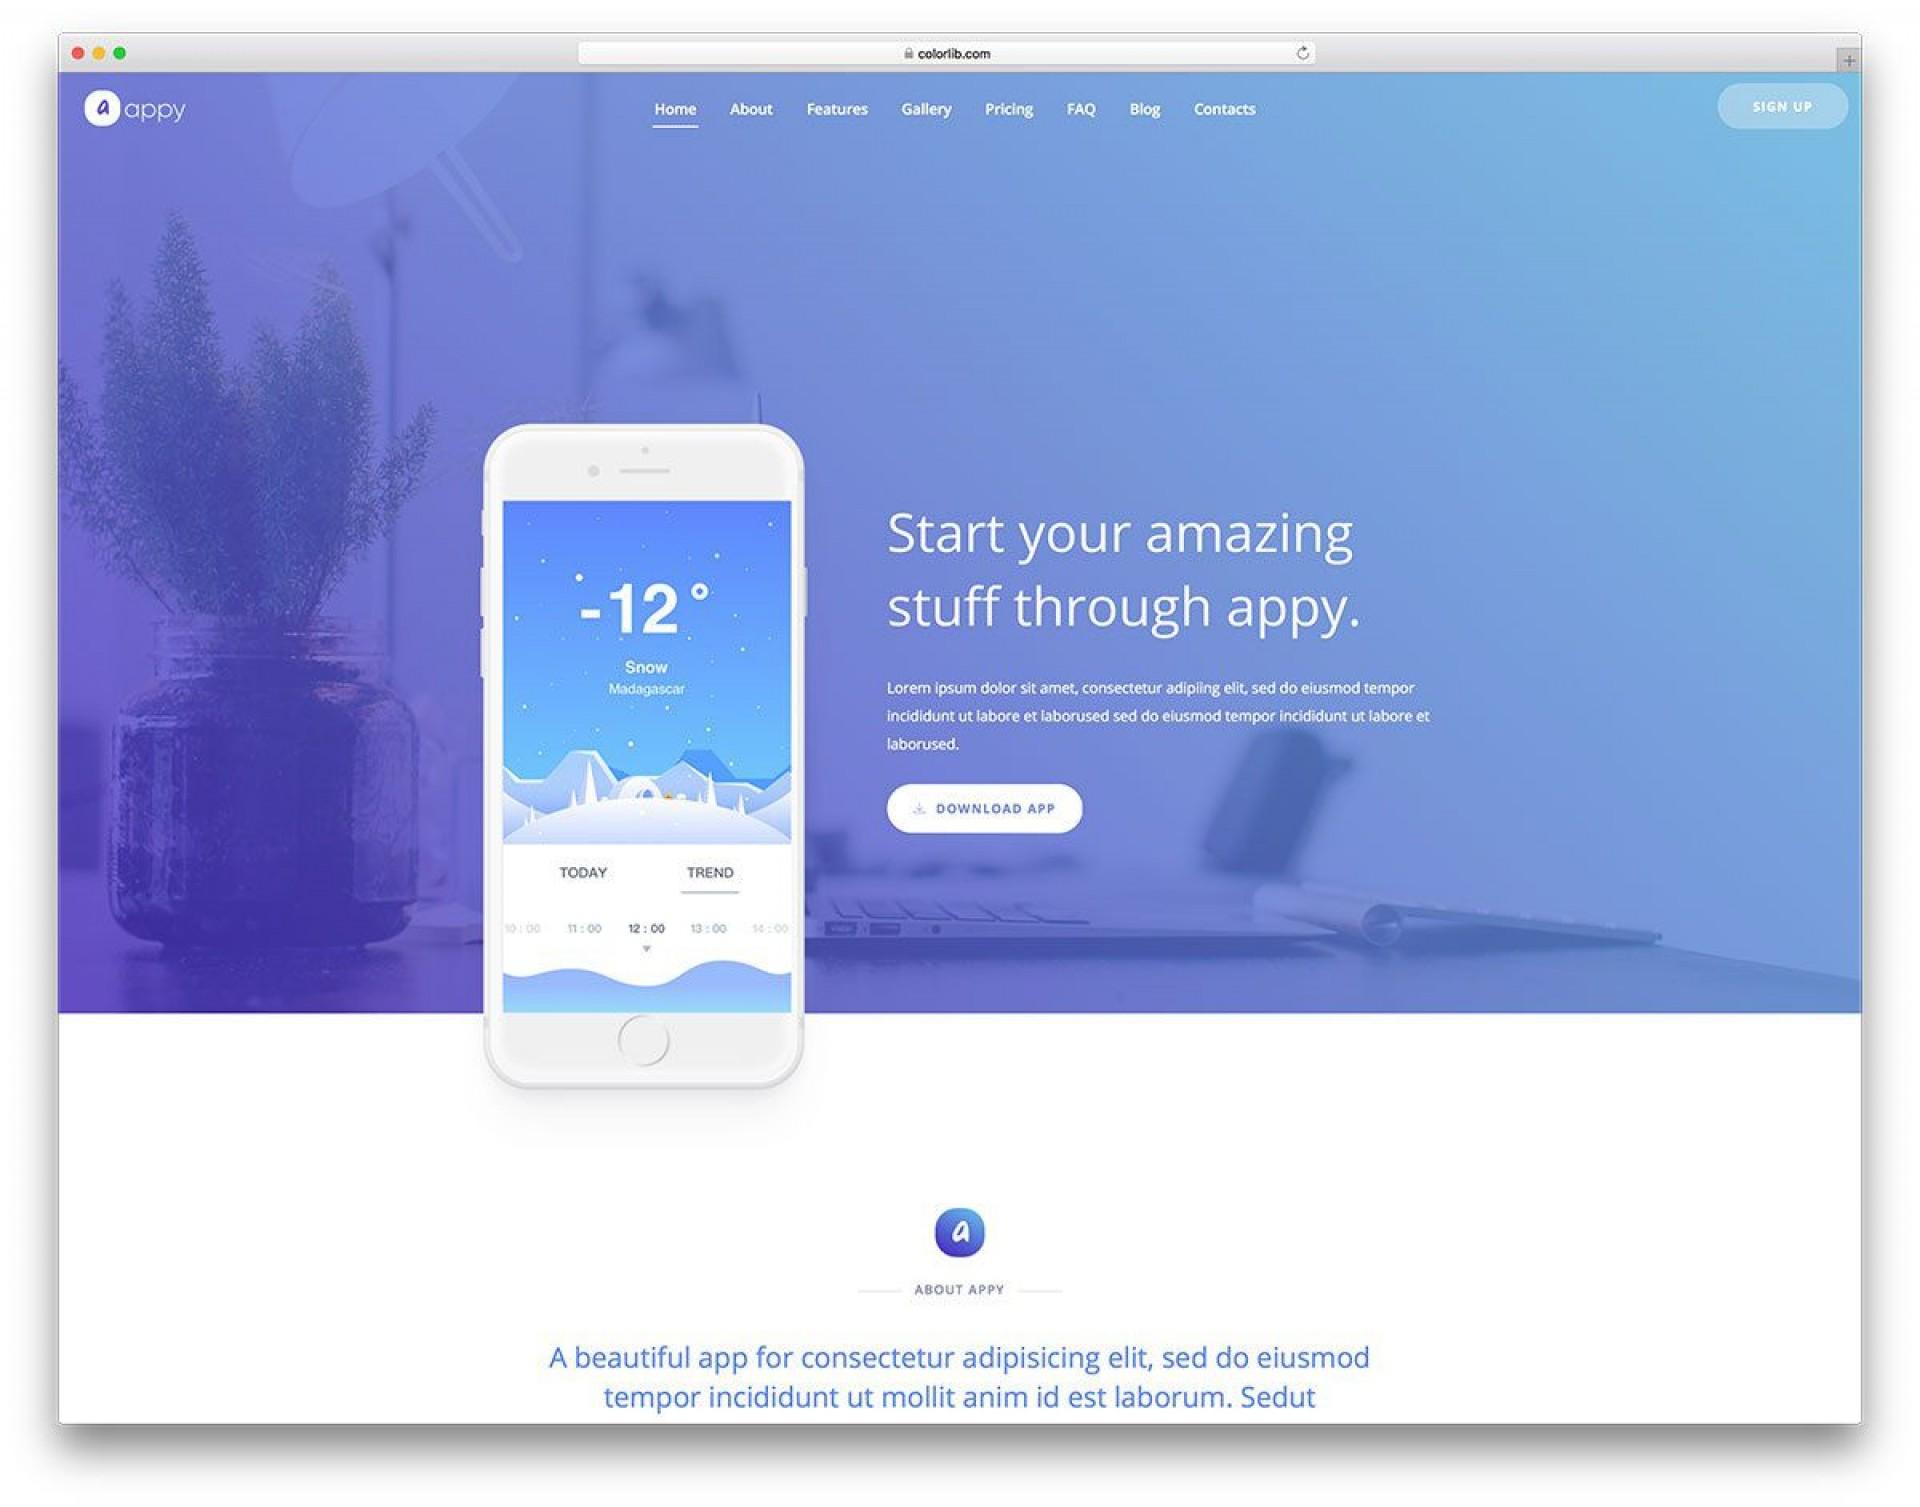 006 Astounding Web Page Design Template Cs Highest Clarity  Css1920